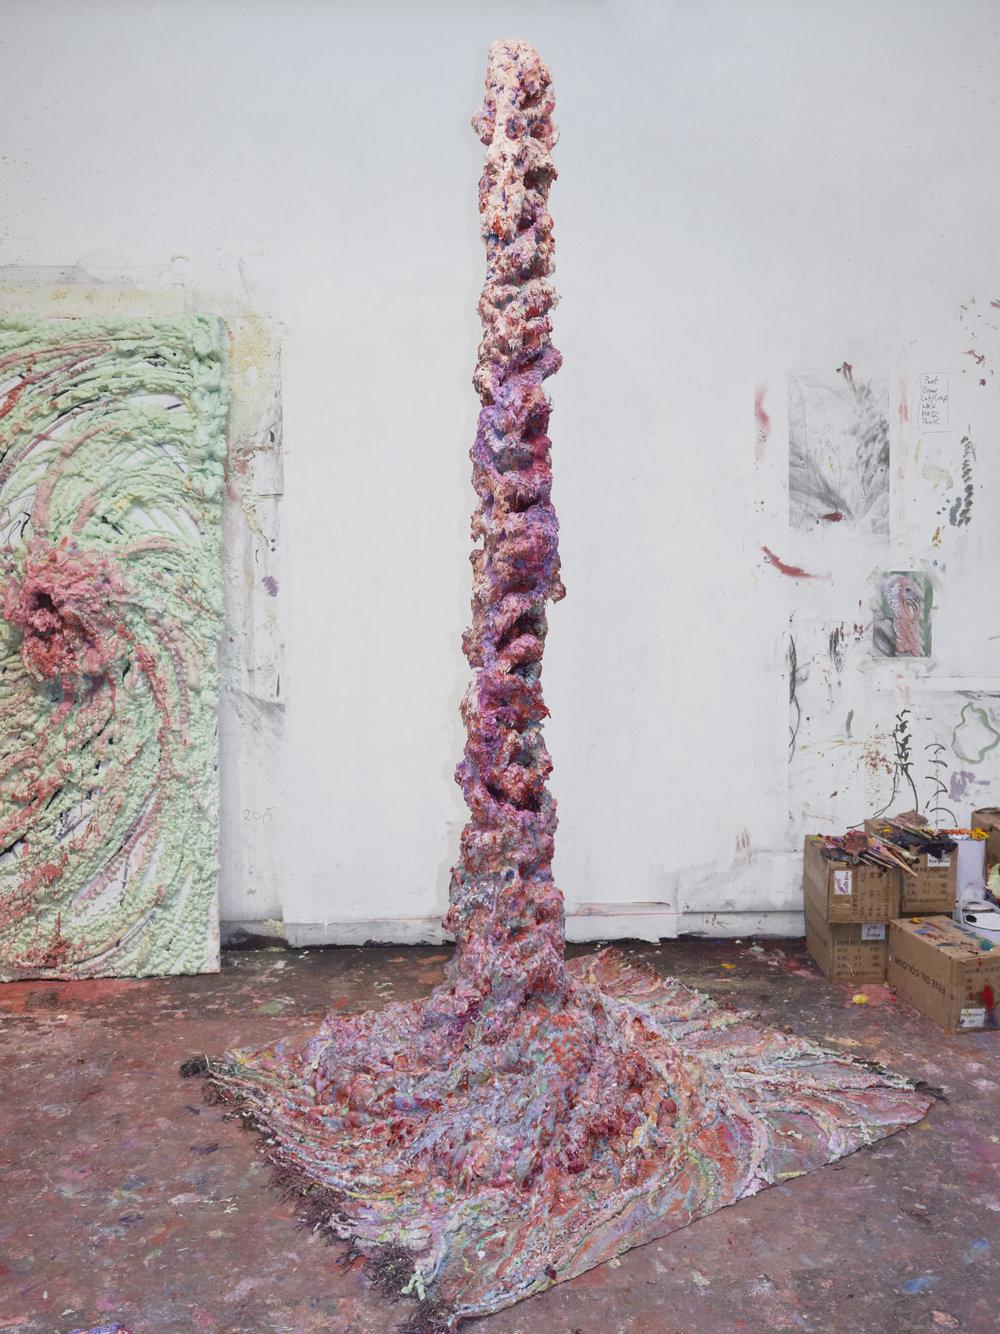 Genesis, 2019  Oil, gesso, acrylic, polyurethane foam, wooden structure on carpet  255x24x20 x 146x130 cm